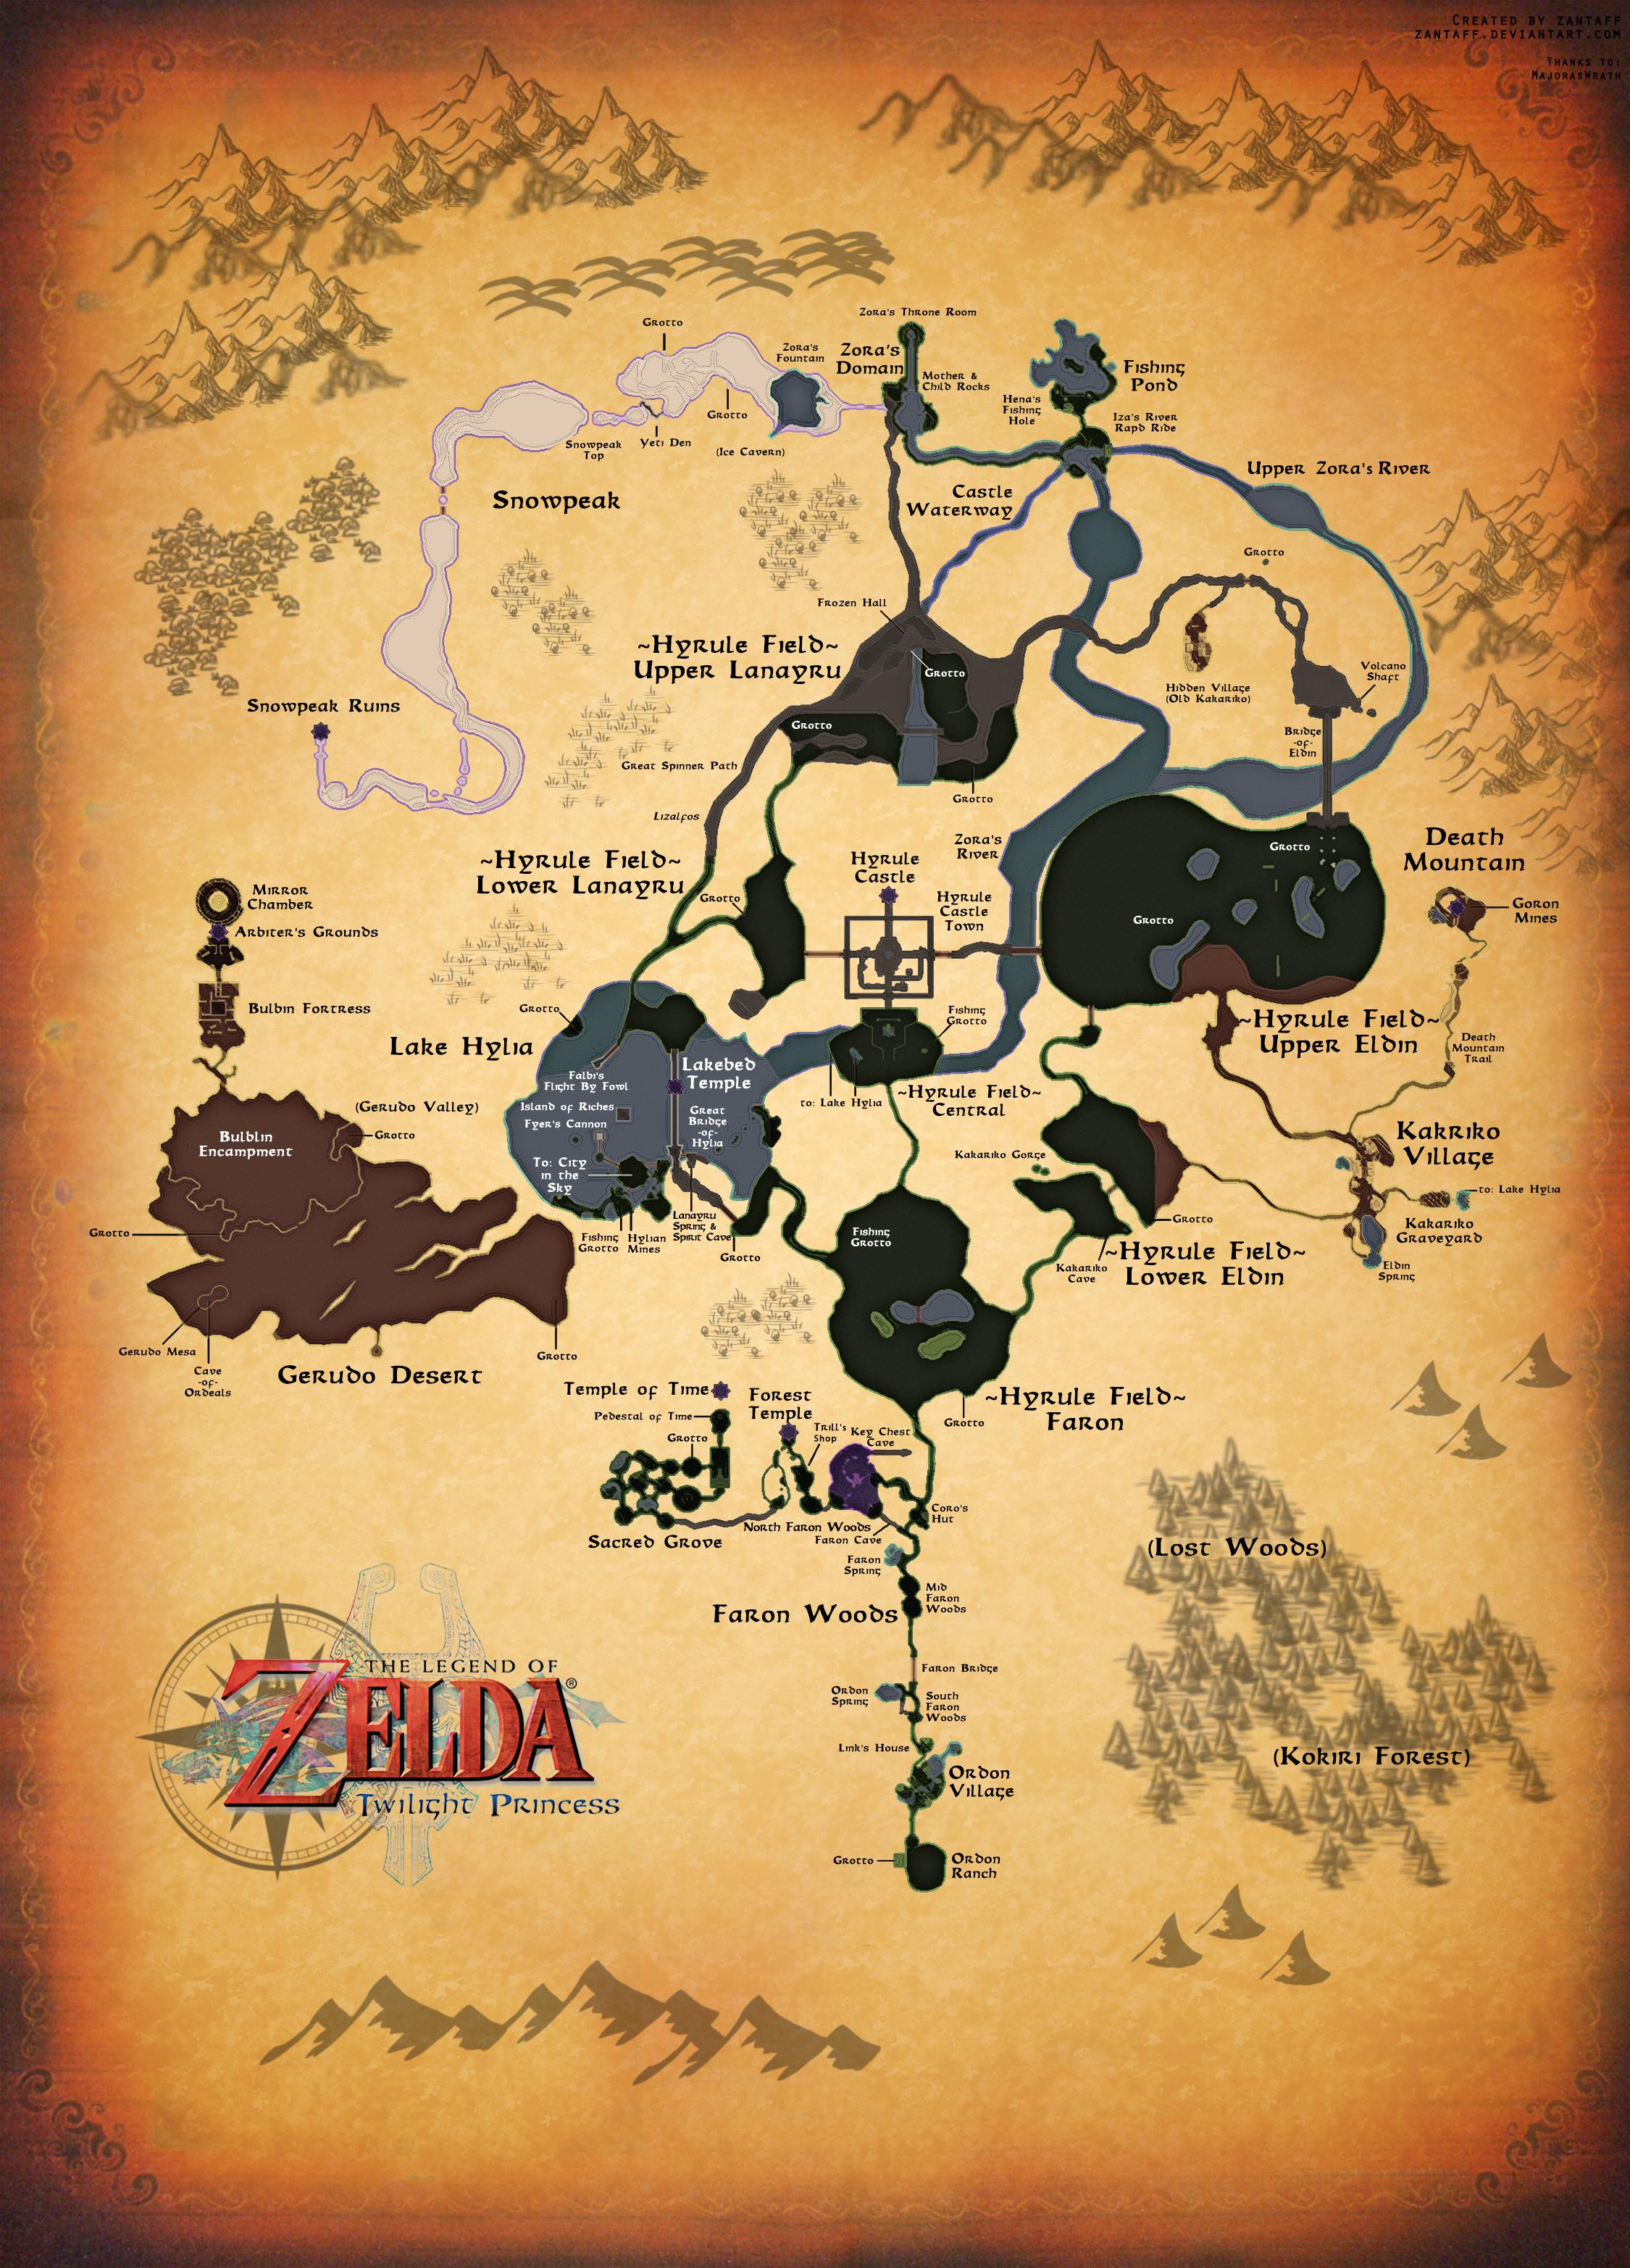 twilight princess full map by zantaff on deviantart